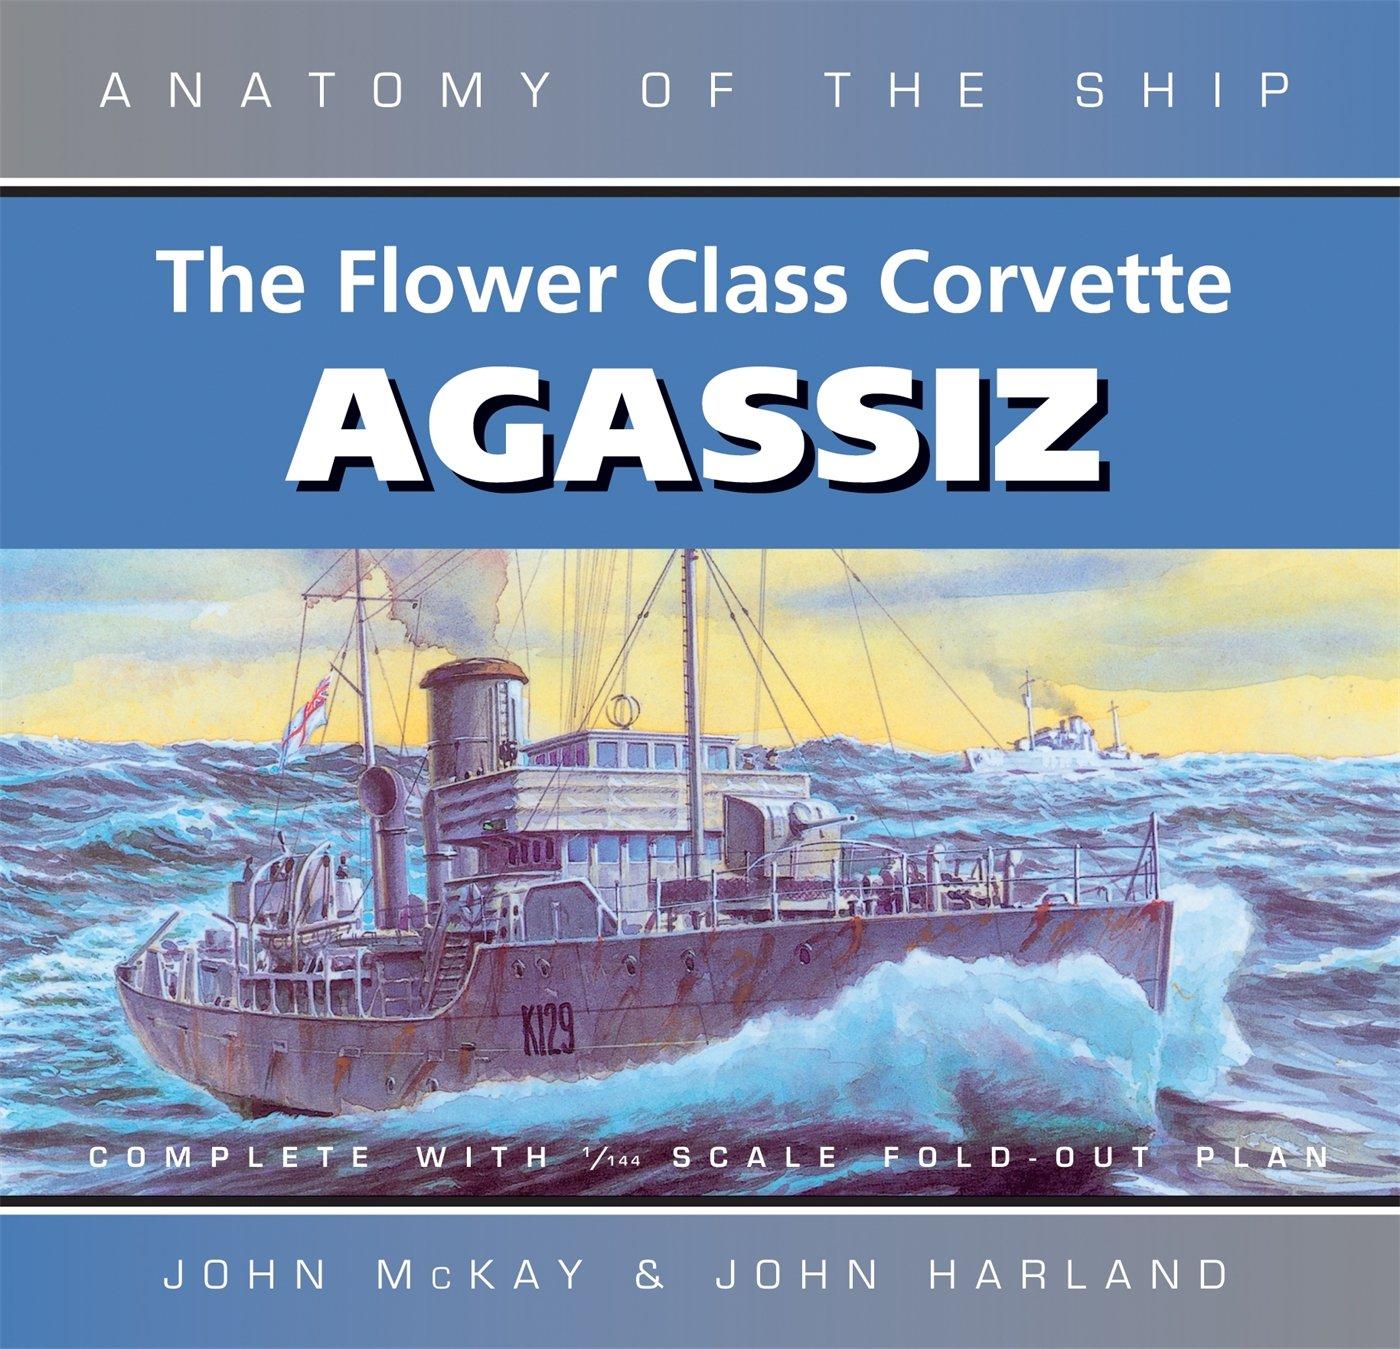 The Flower Class Corvette Agassiz (Anatomy of the Ship